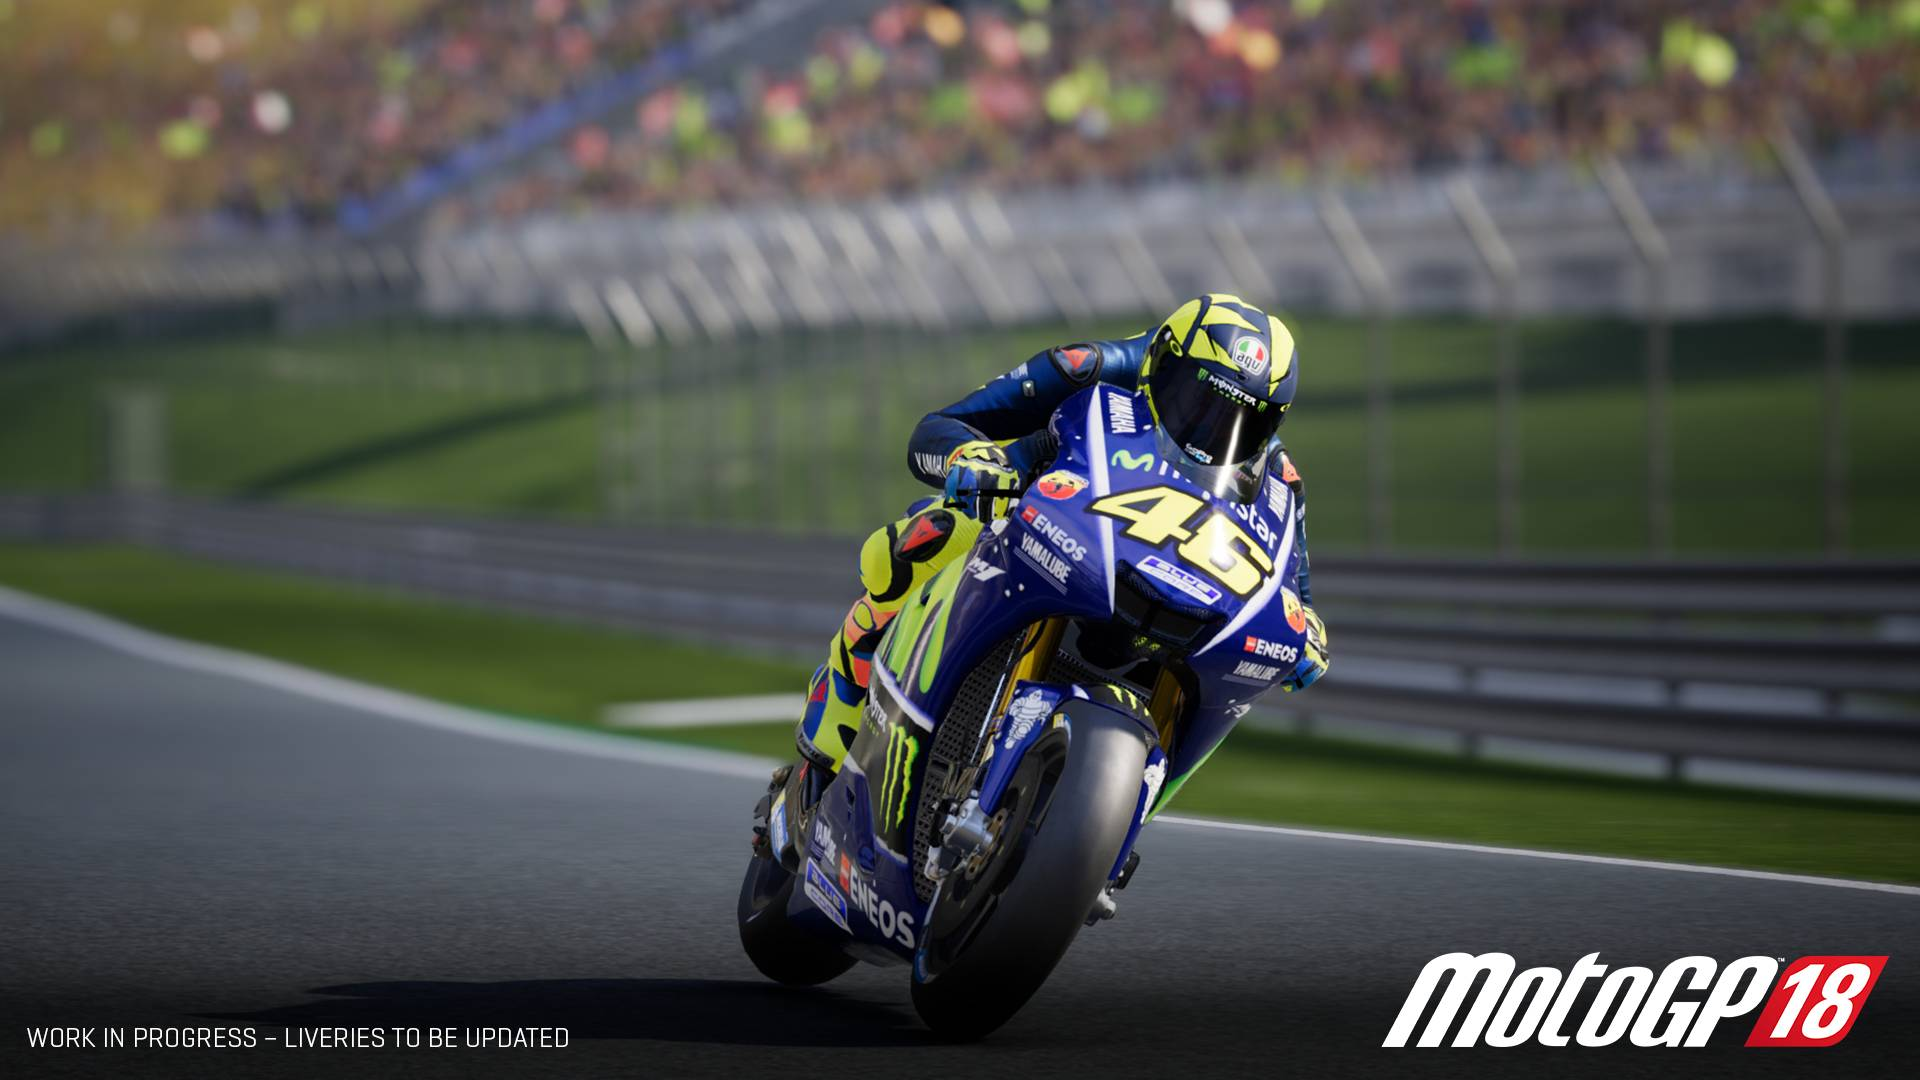 MotoGP 18 Heading To Nintendo Switch | Handheld Players